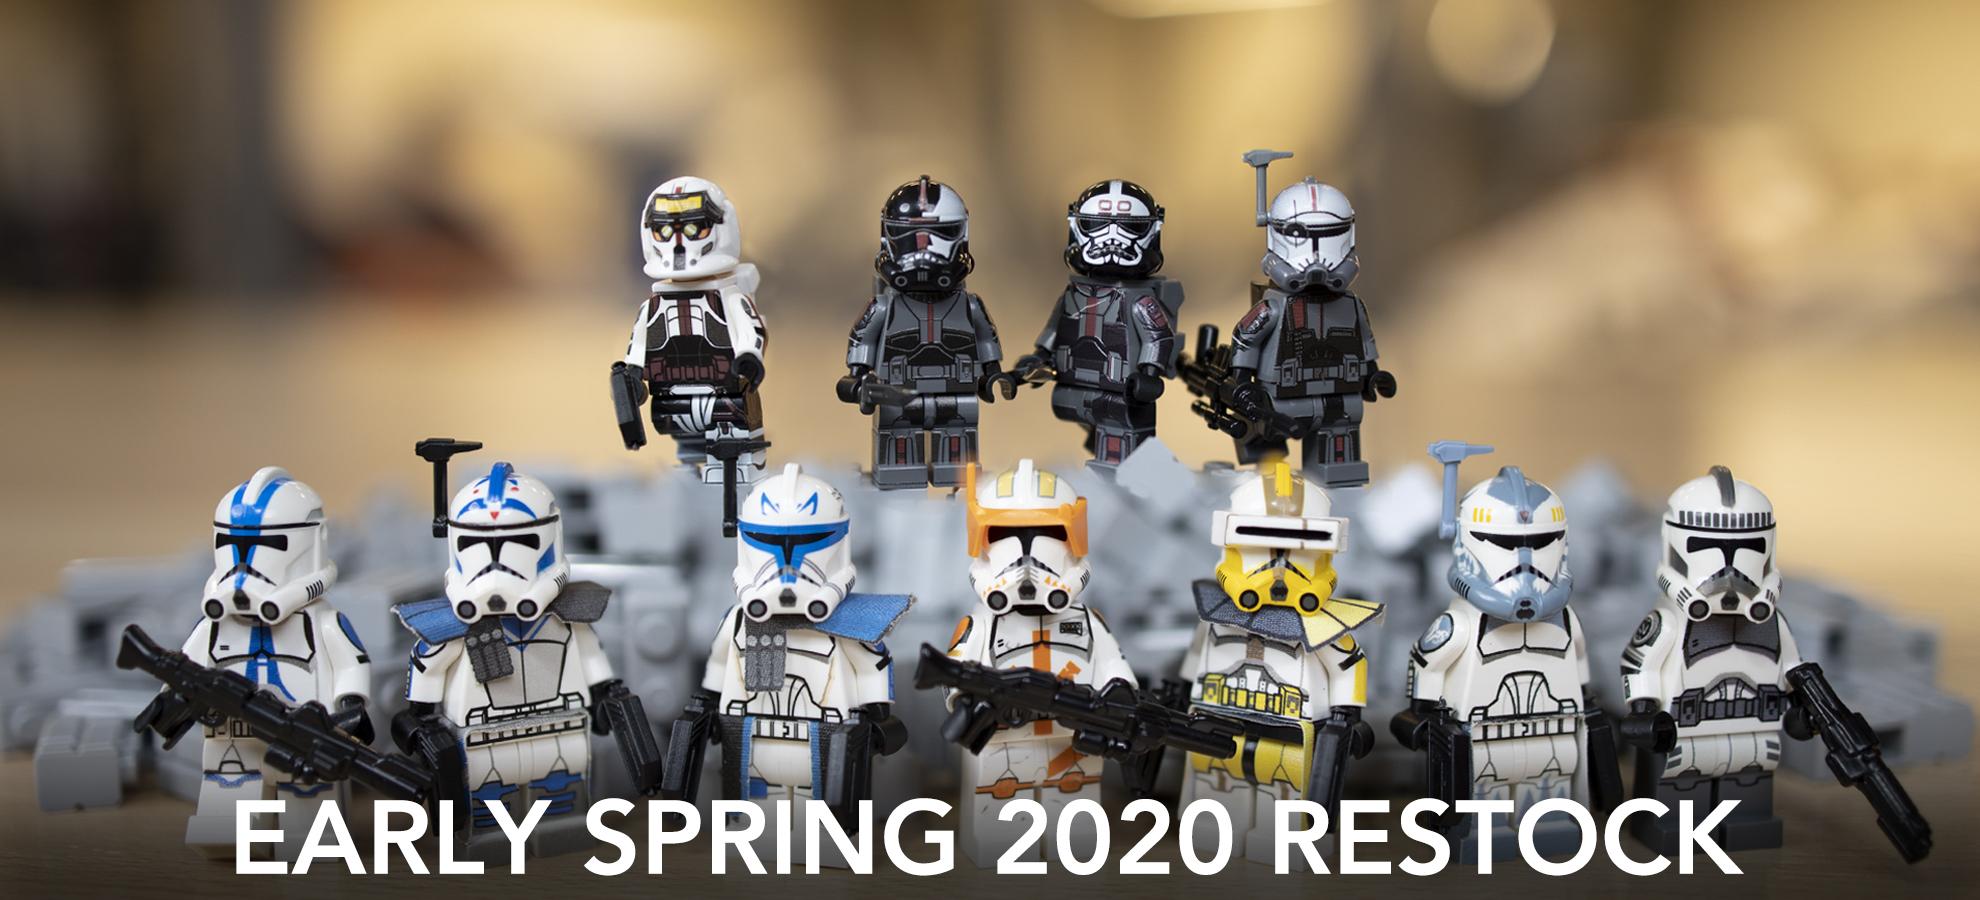 Lego Compatible Star Wars 5 x Stormtrooper Minifigures New